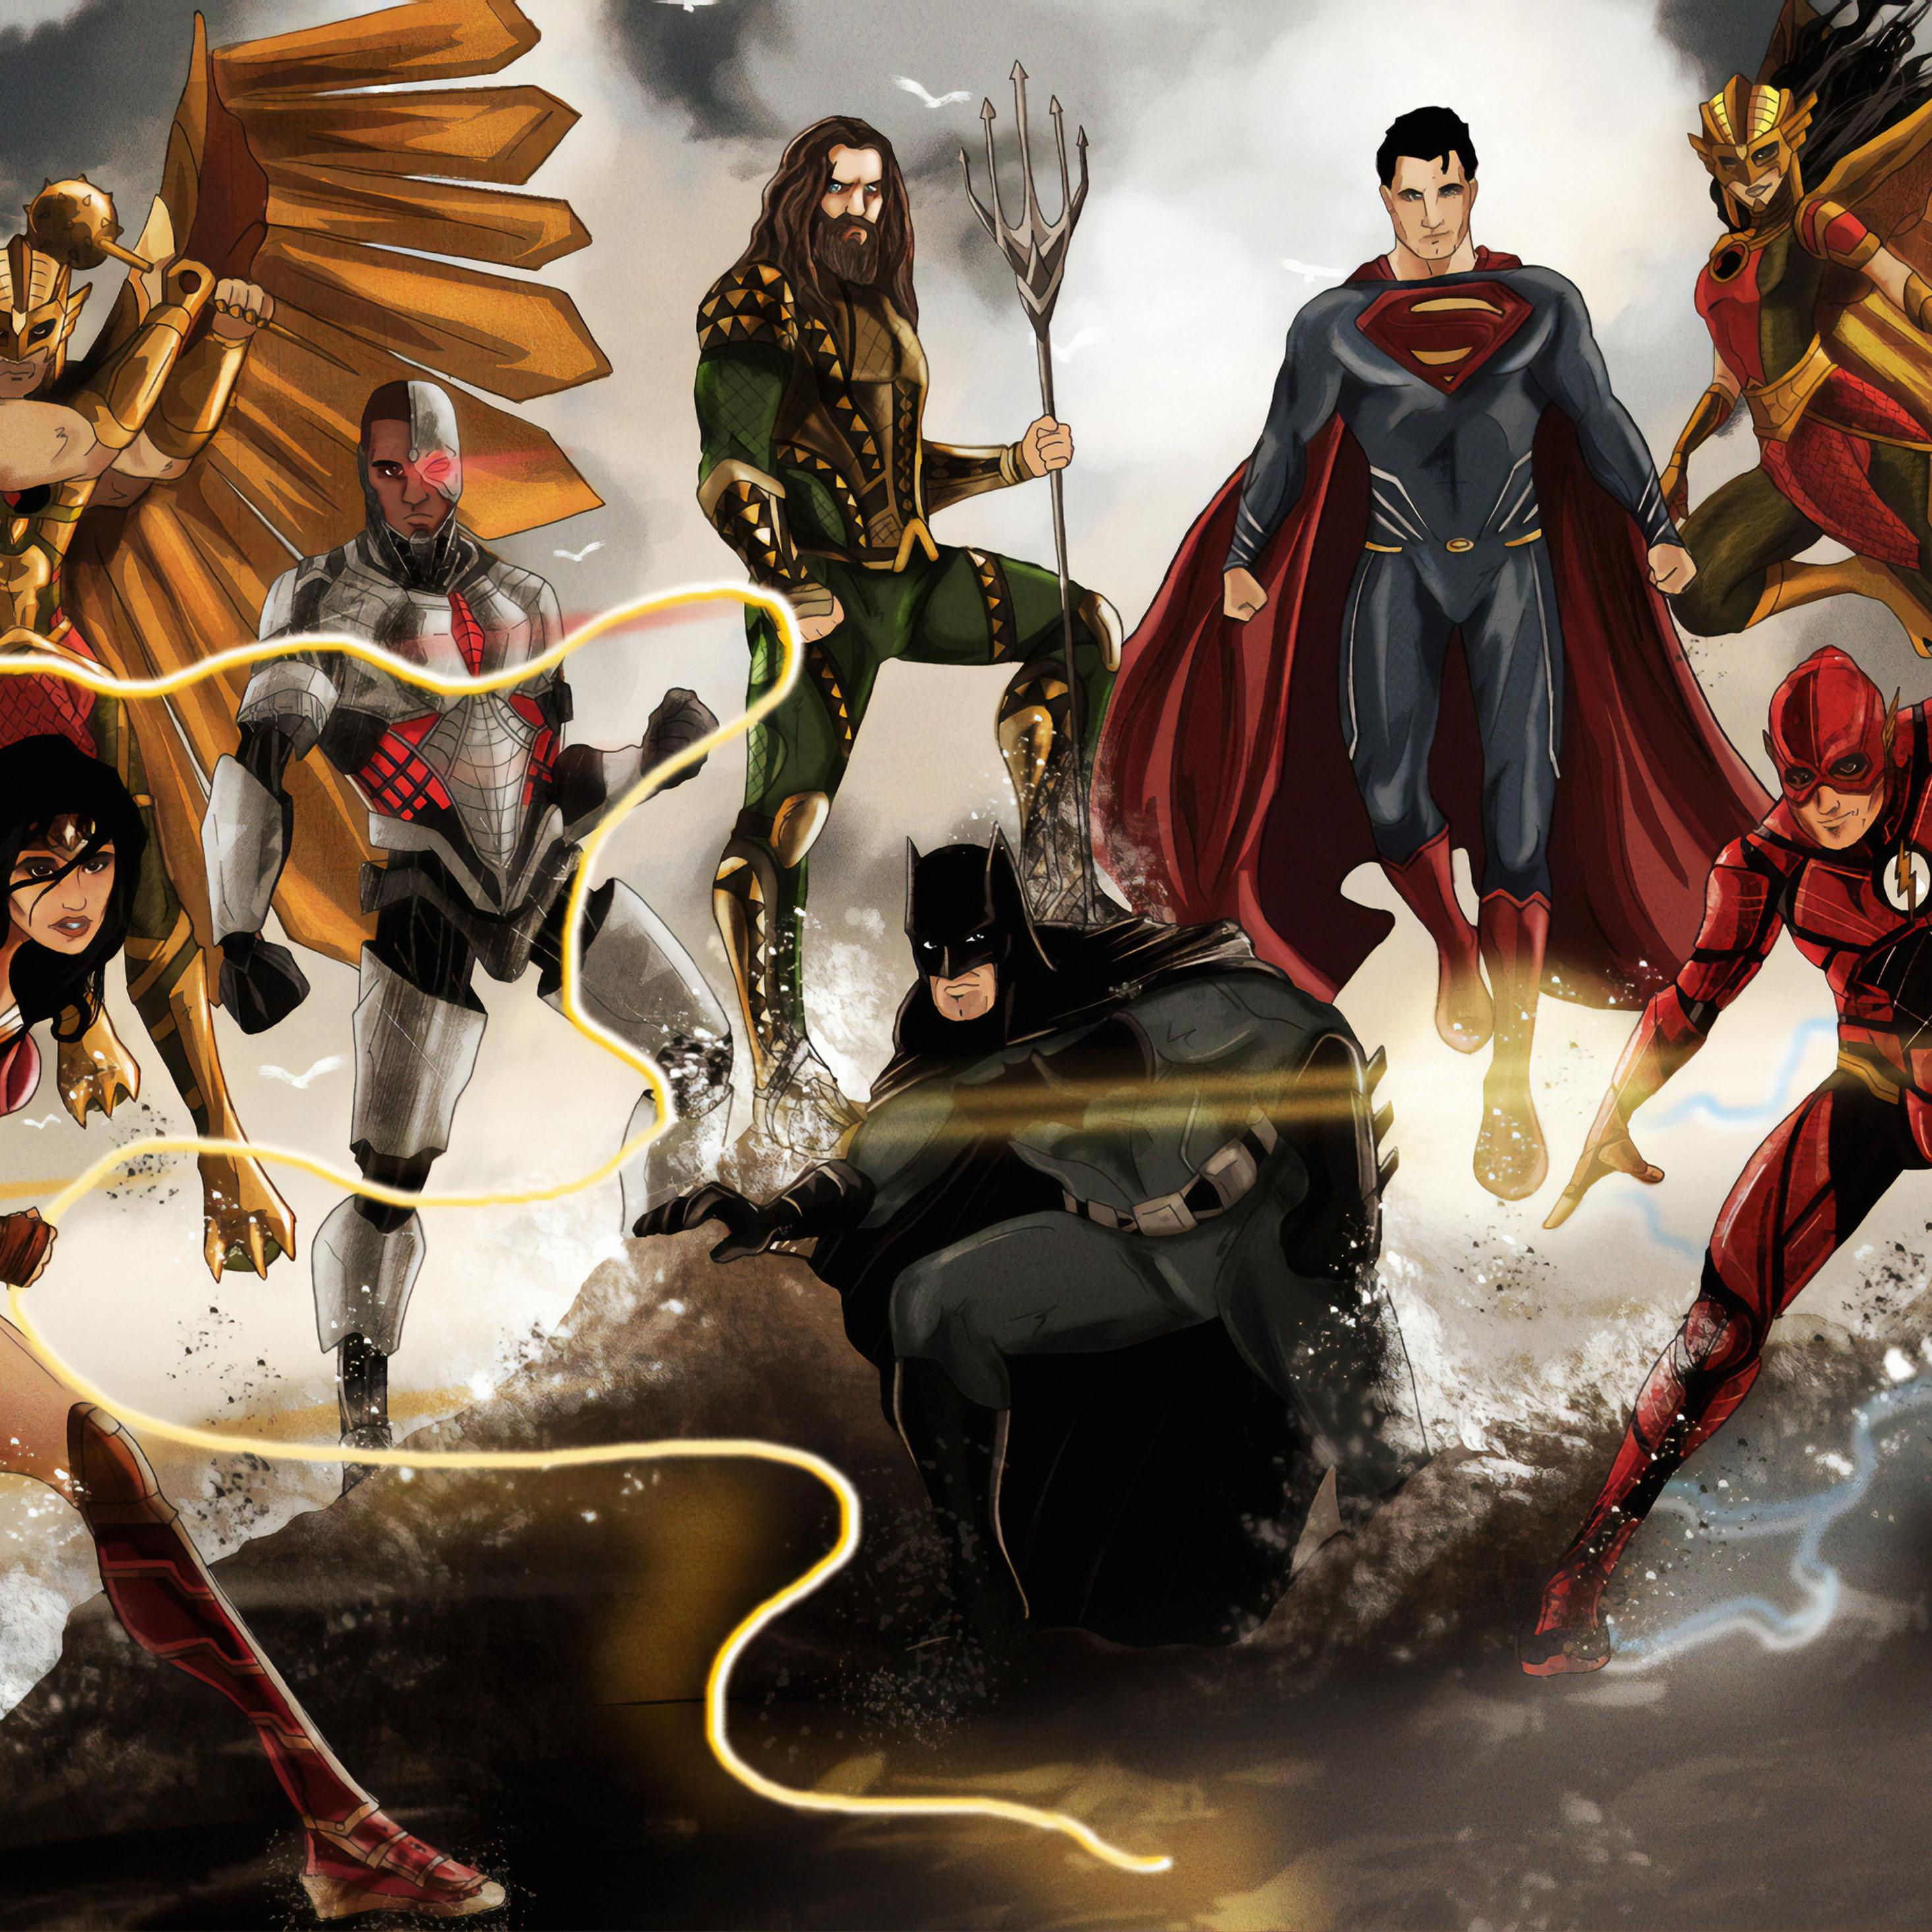 justice-league-art-4k-new-2t.jpg